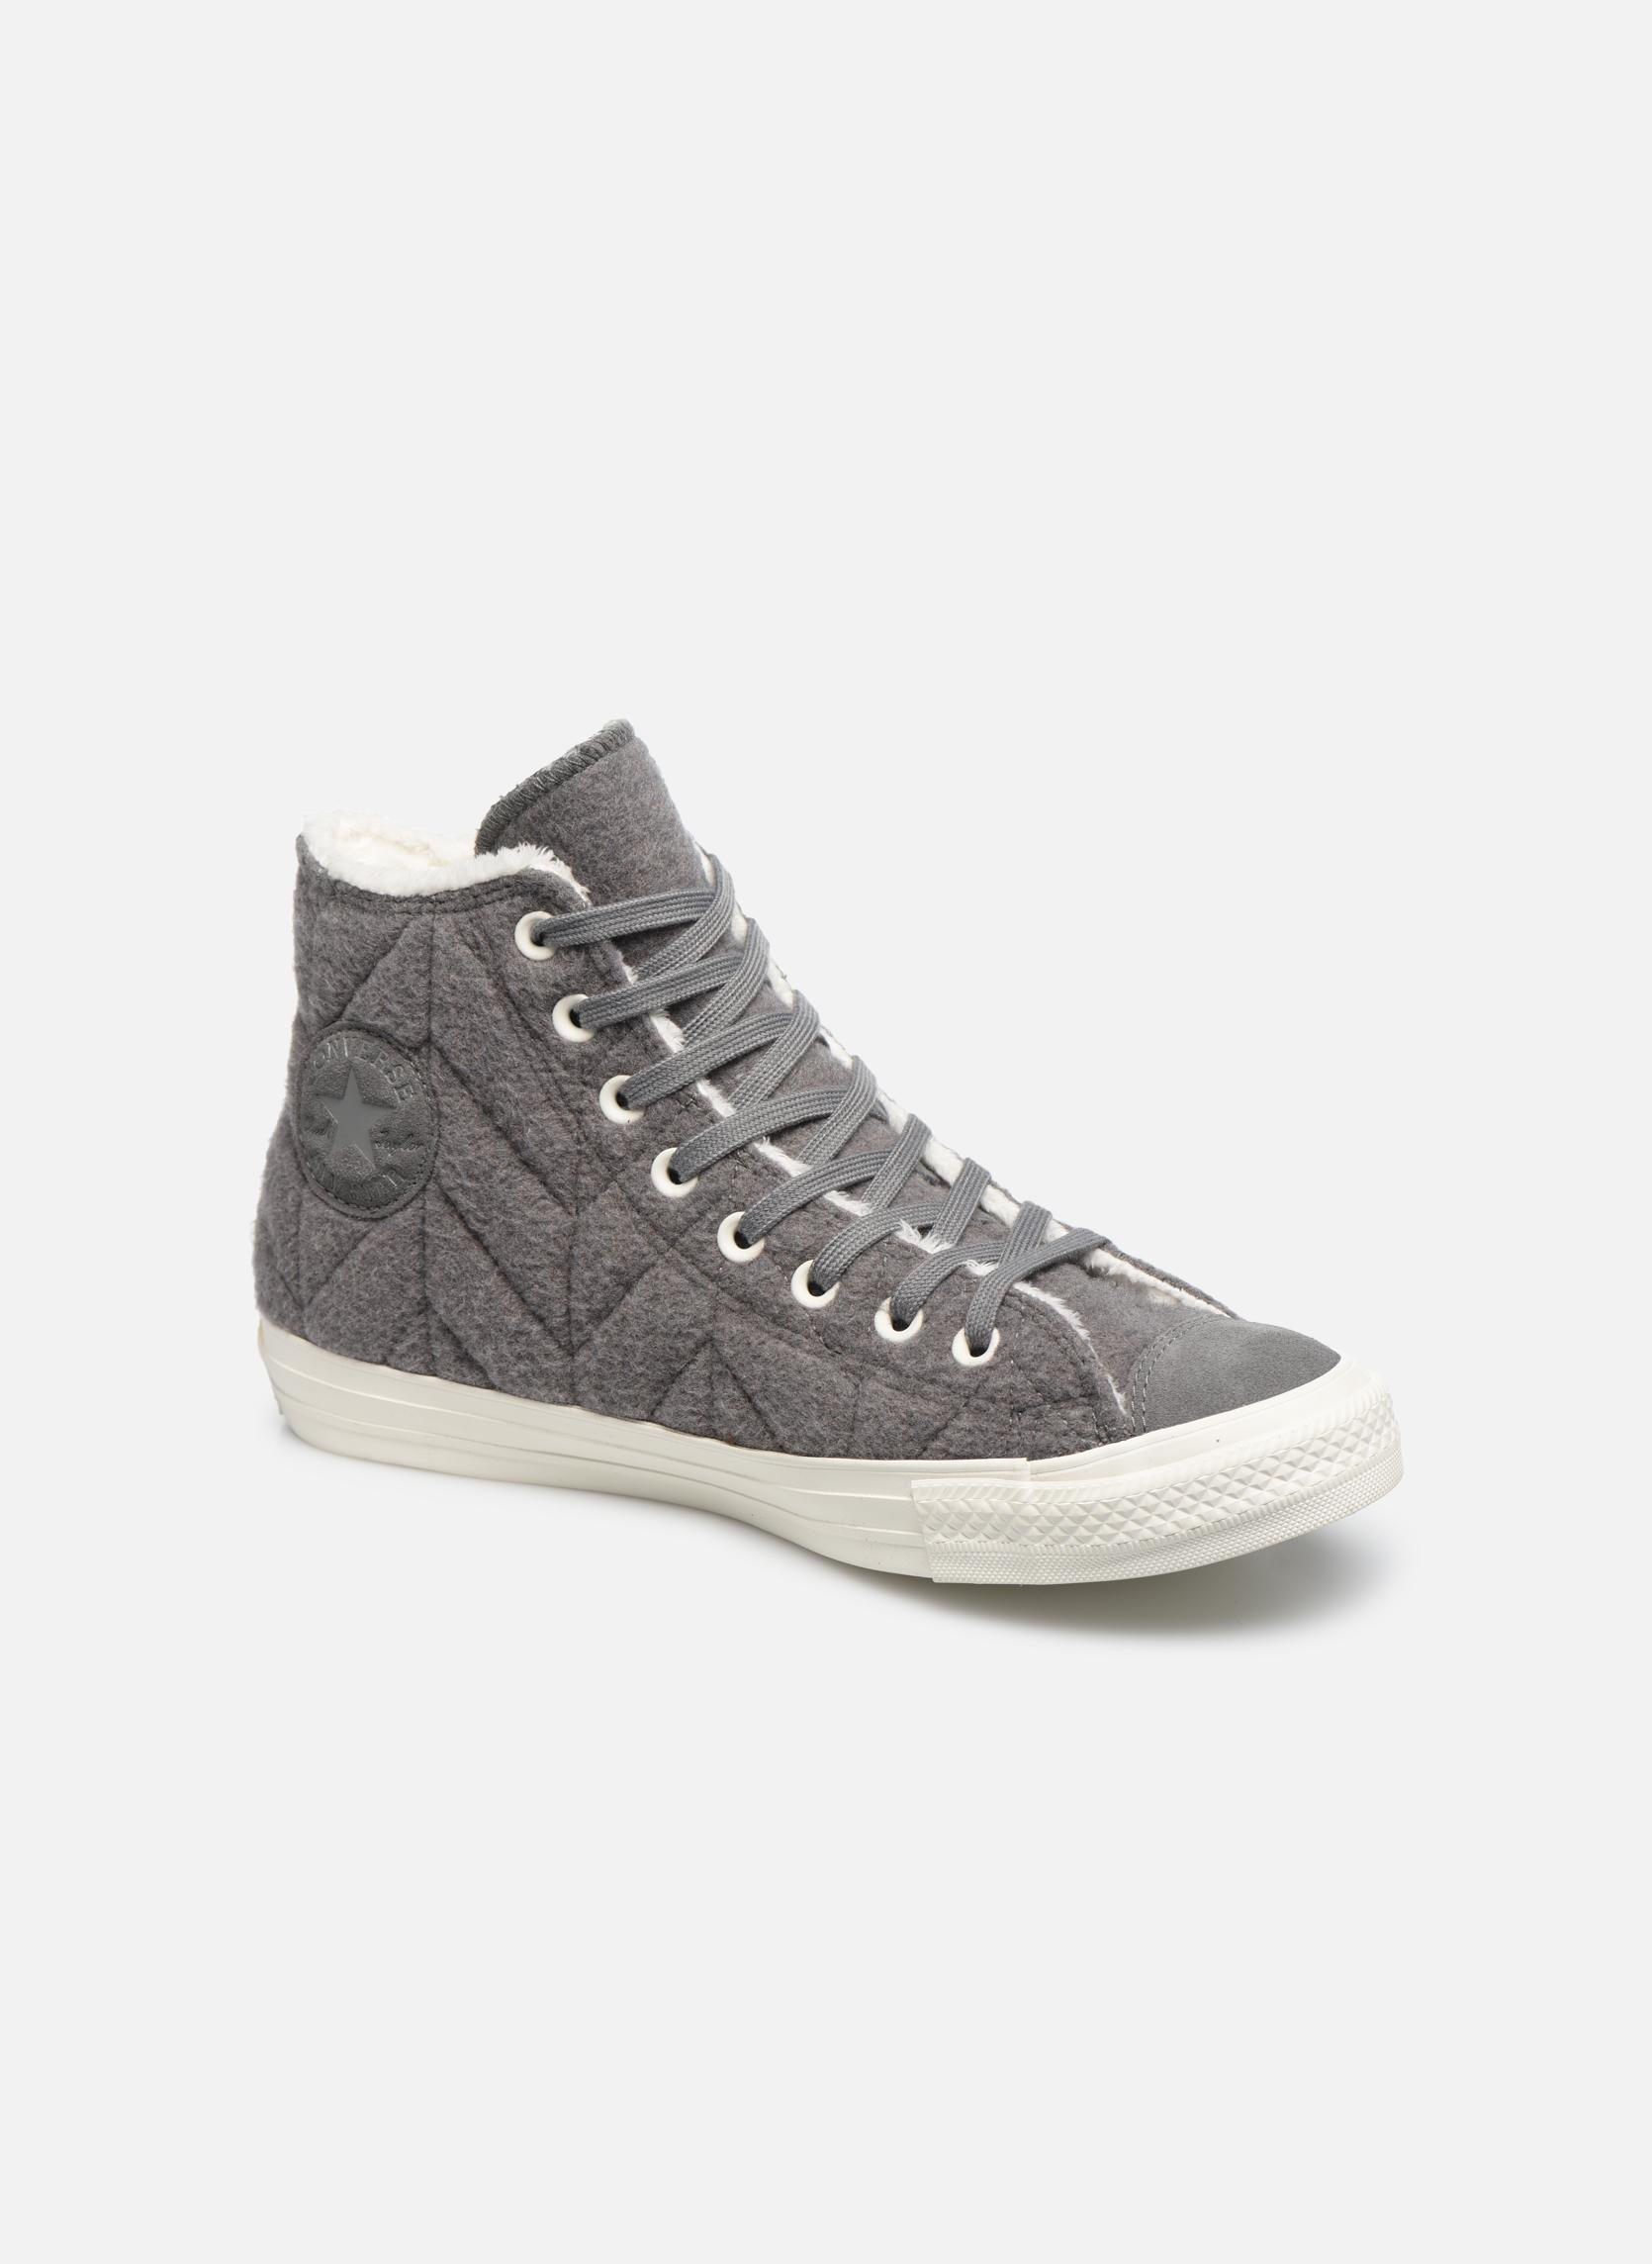 Charcoal Grey/Charcoal Grey/Egret